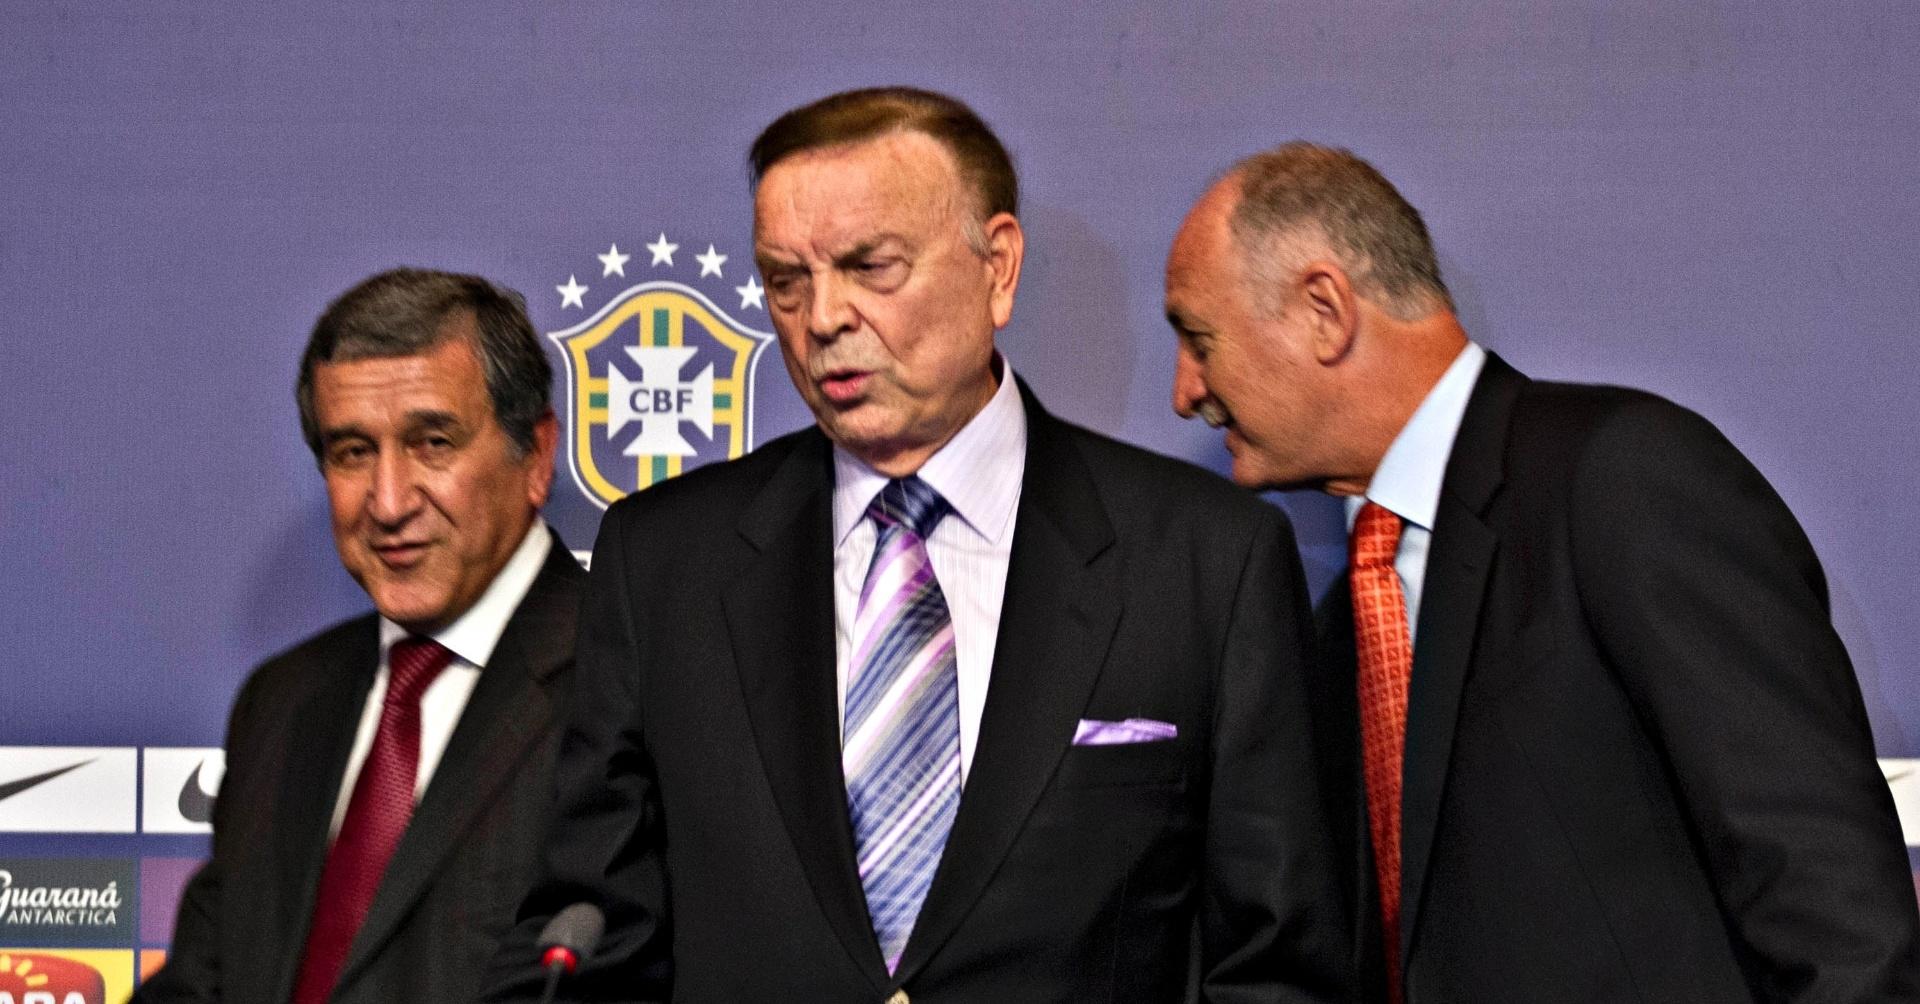 22.jan.2013 - Presidente da CBF, José Maria Marin, é visto entre o técnico da seleção brasileira, Luiz Felipe Scolari (d), e o coordenador técnico Carlos Alberto Parreira